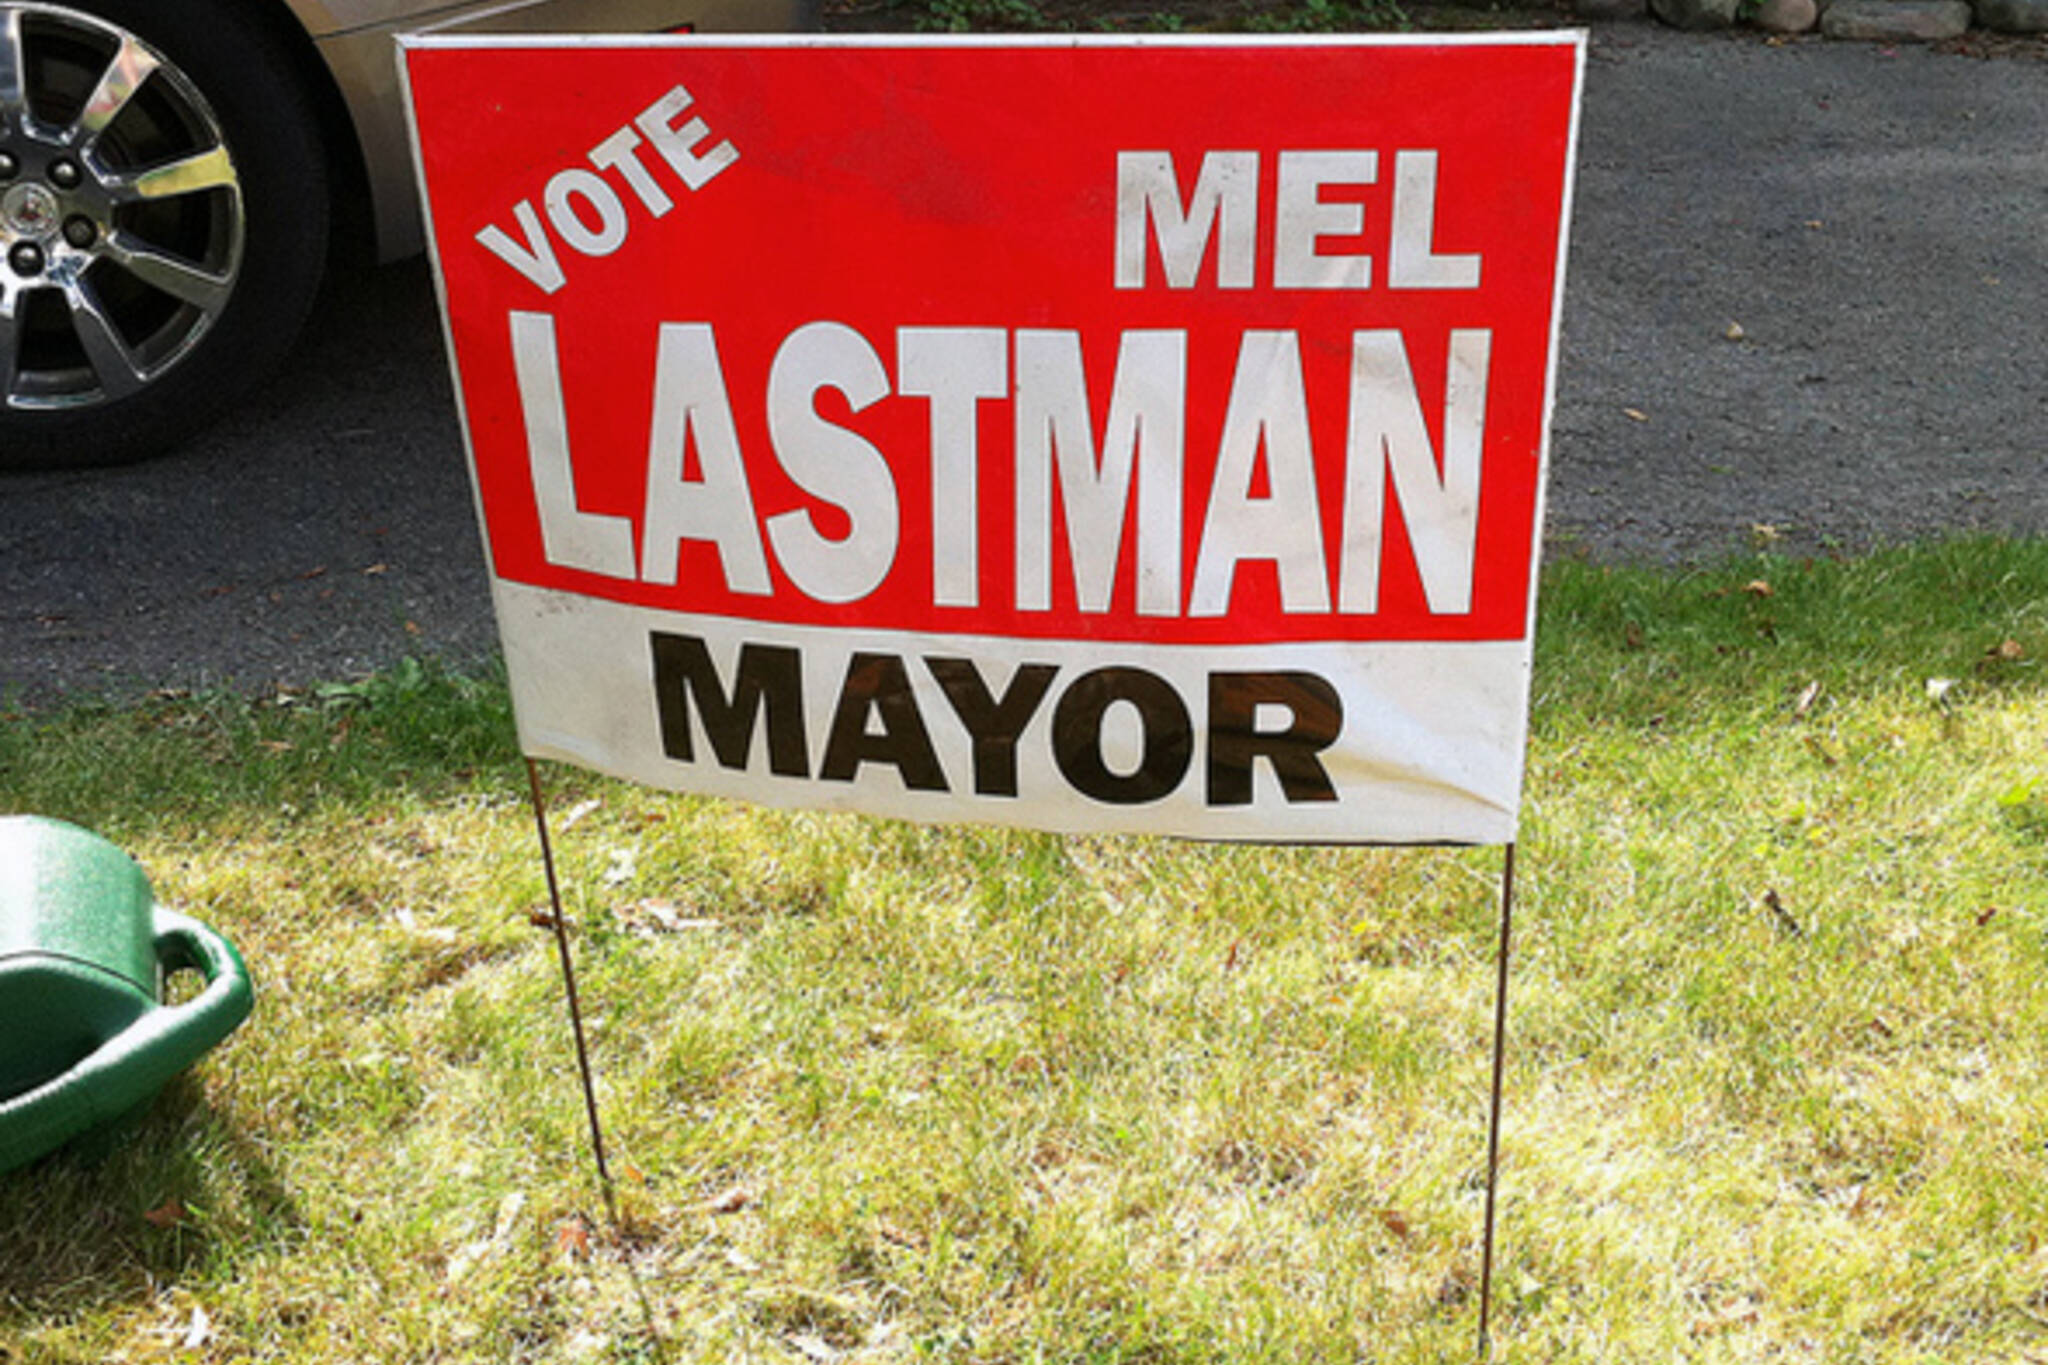 Mel Lastman Mayor